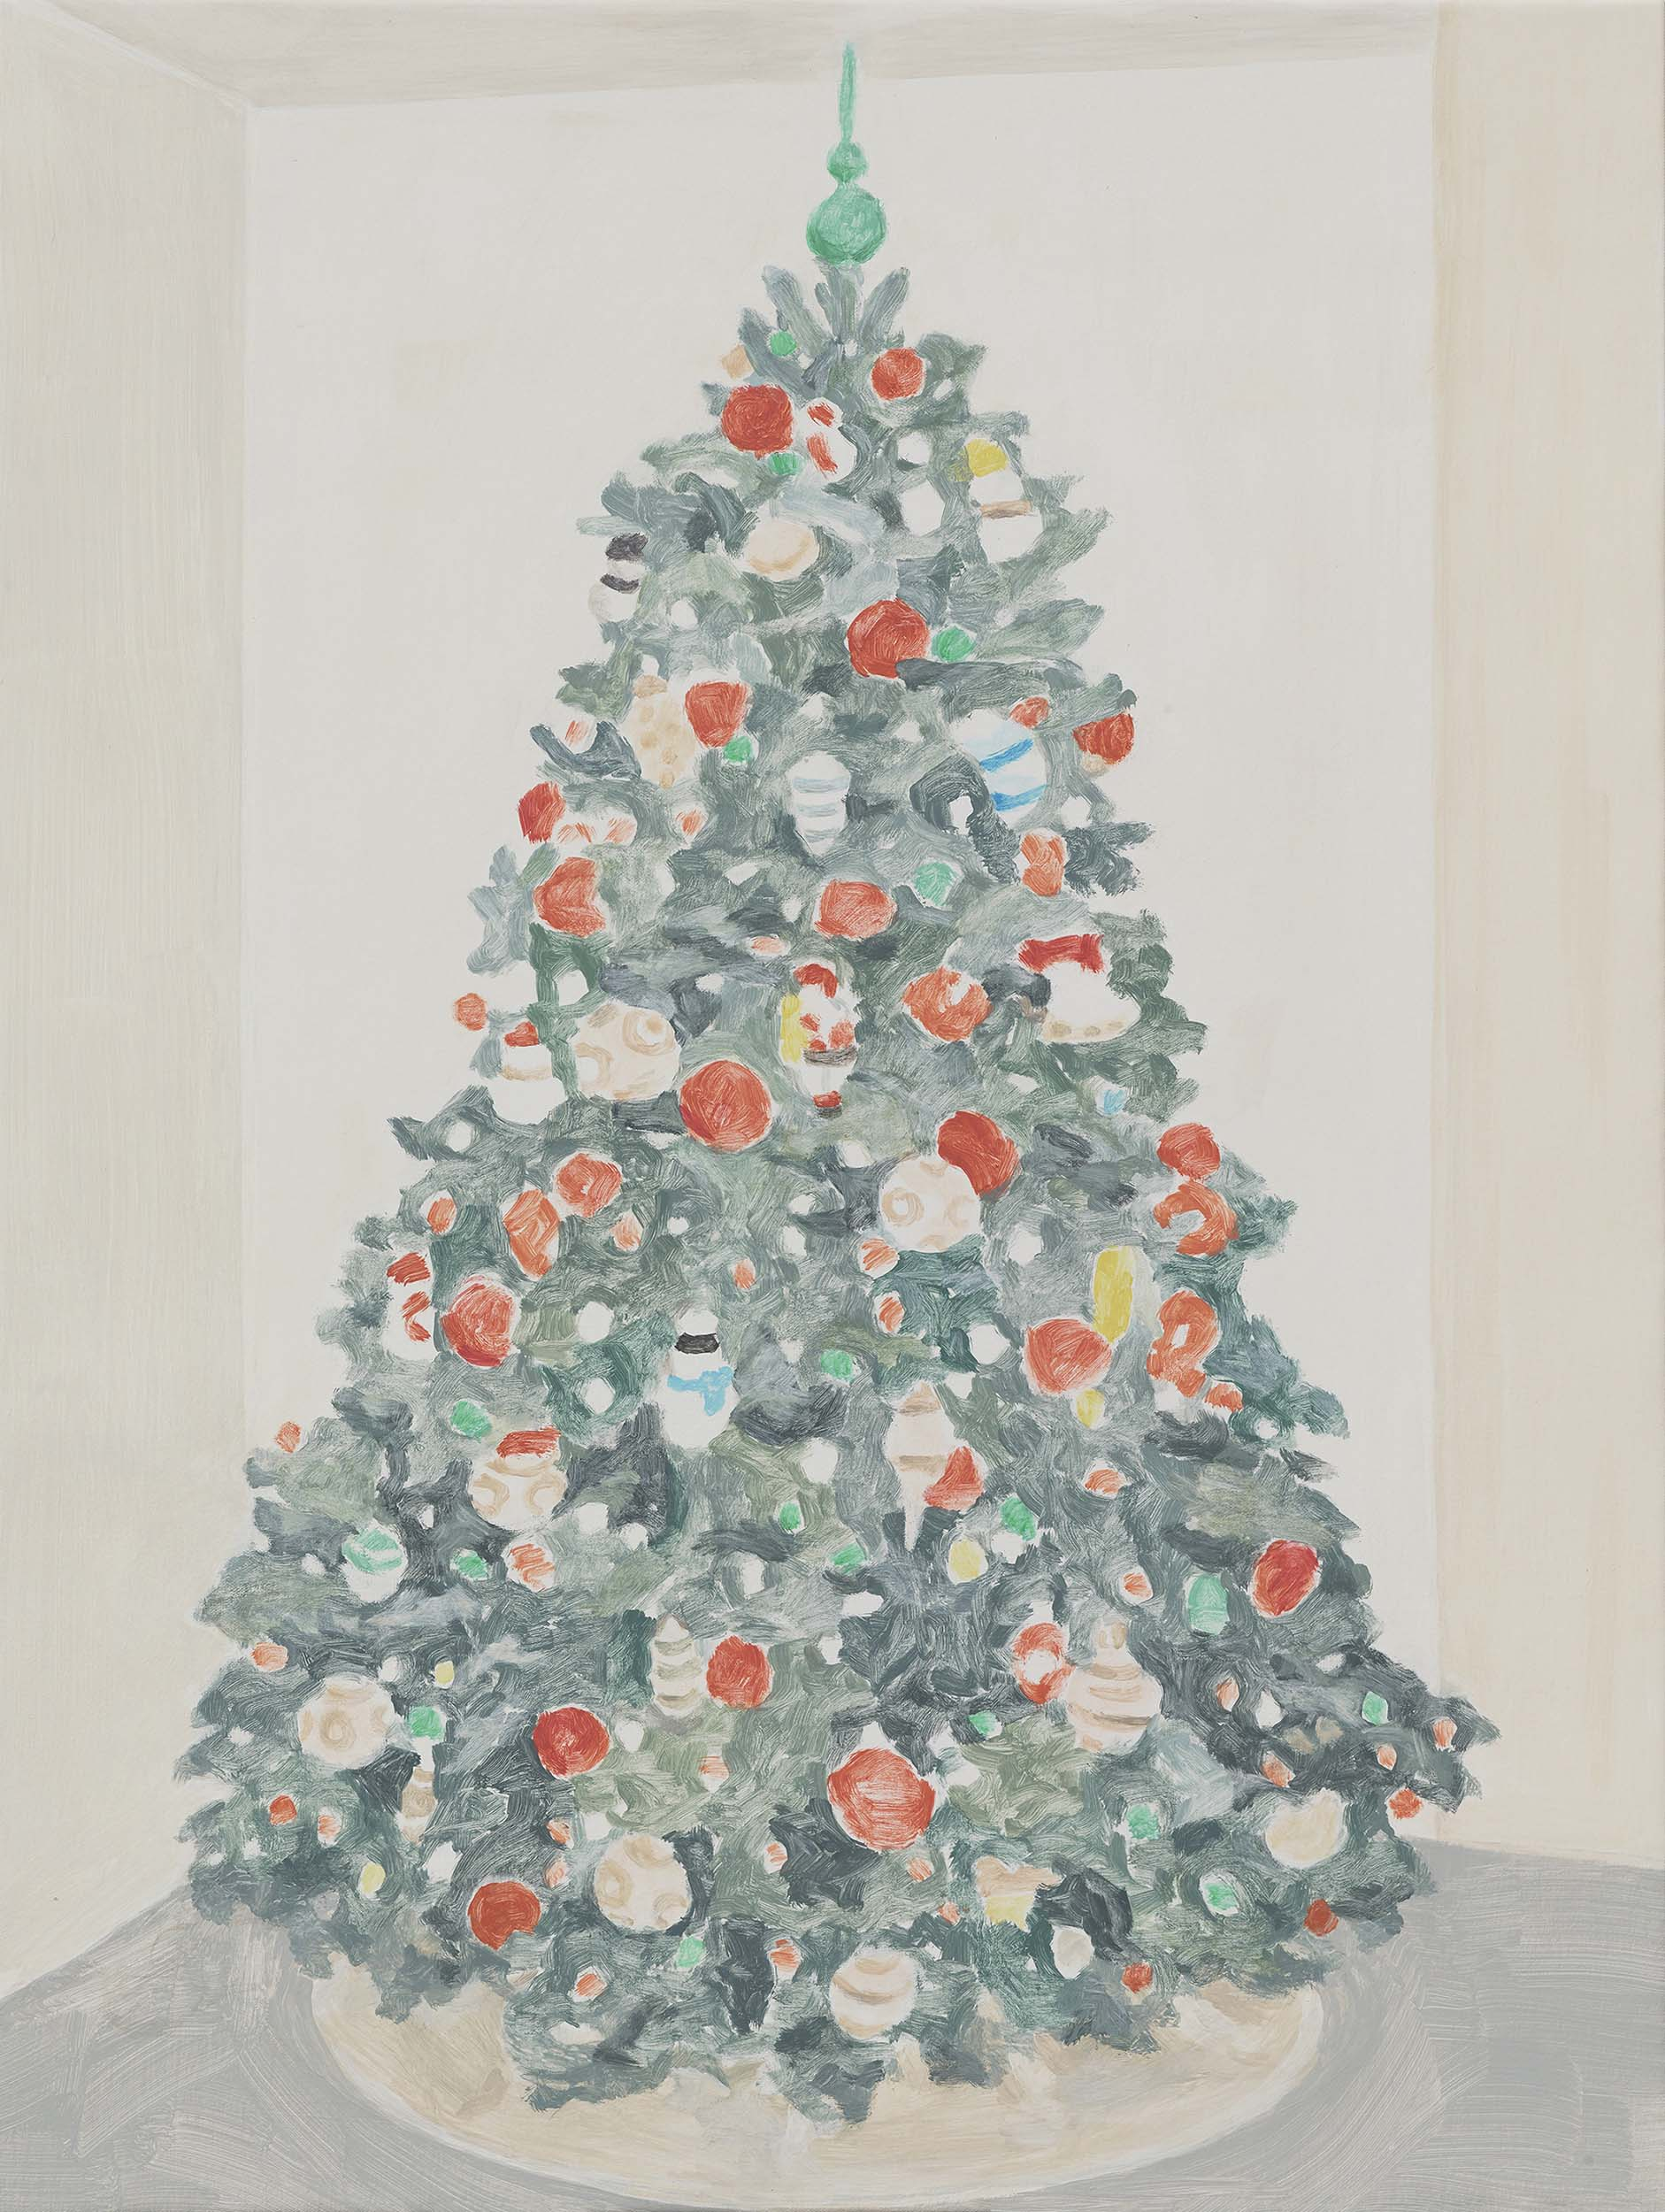 Xmas Tree (green top), acrylic on canvas, 32 x 24.25 inches, 2015.